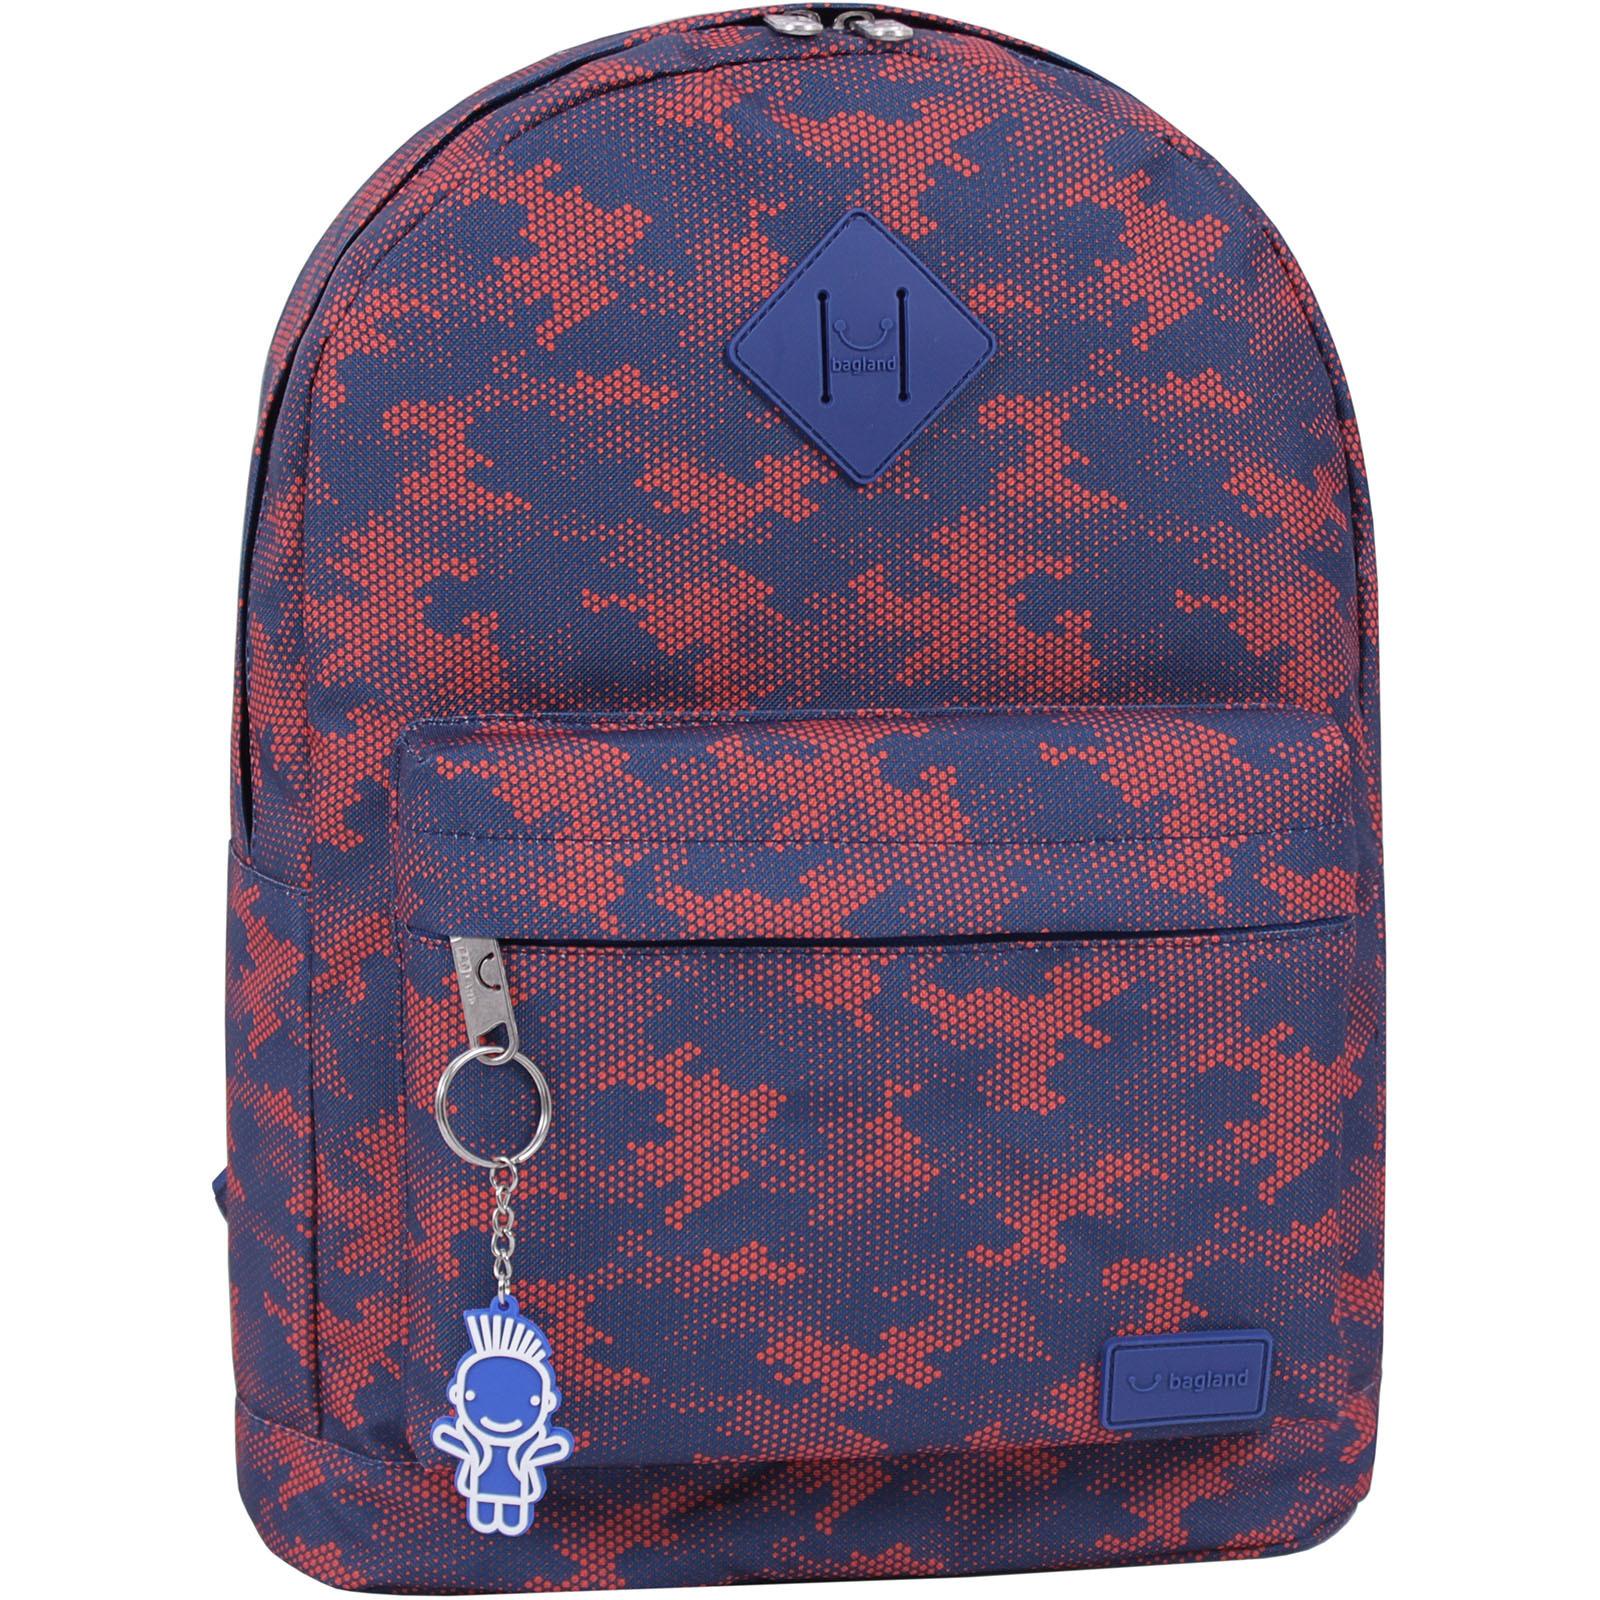 Молодежные рюкзаки Рюкзак Bagland Молодежный 17 л. сублимация 482 (00533664) IMG_9432_суб.482_.JPG